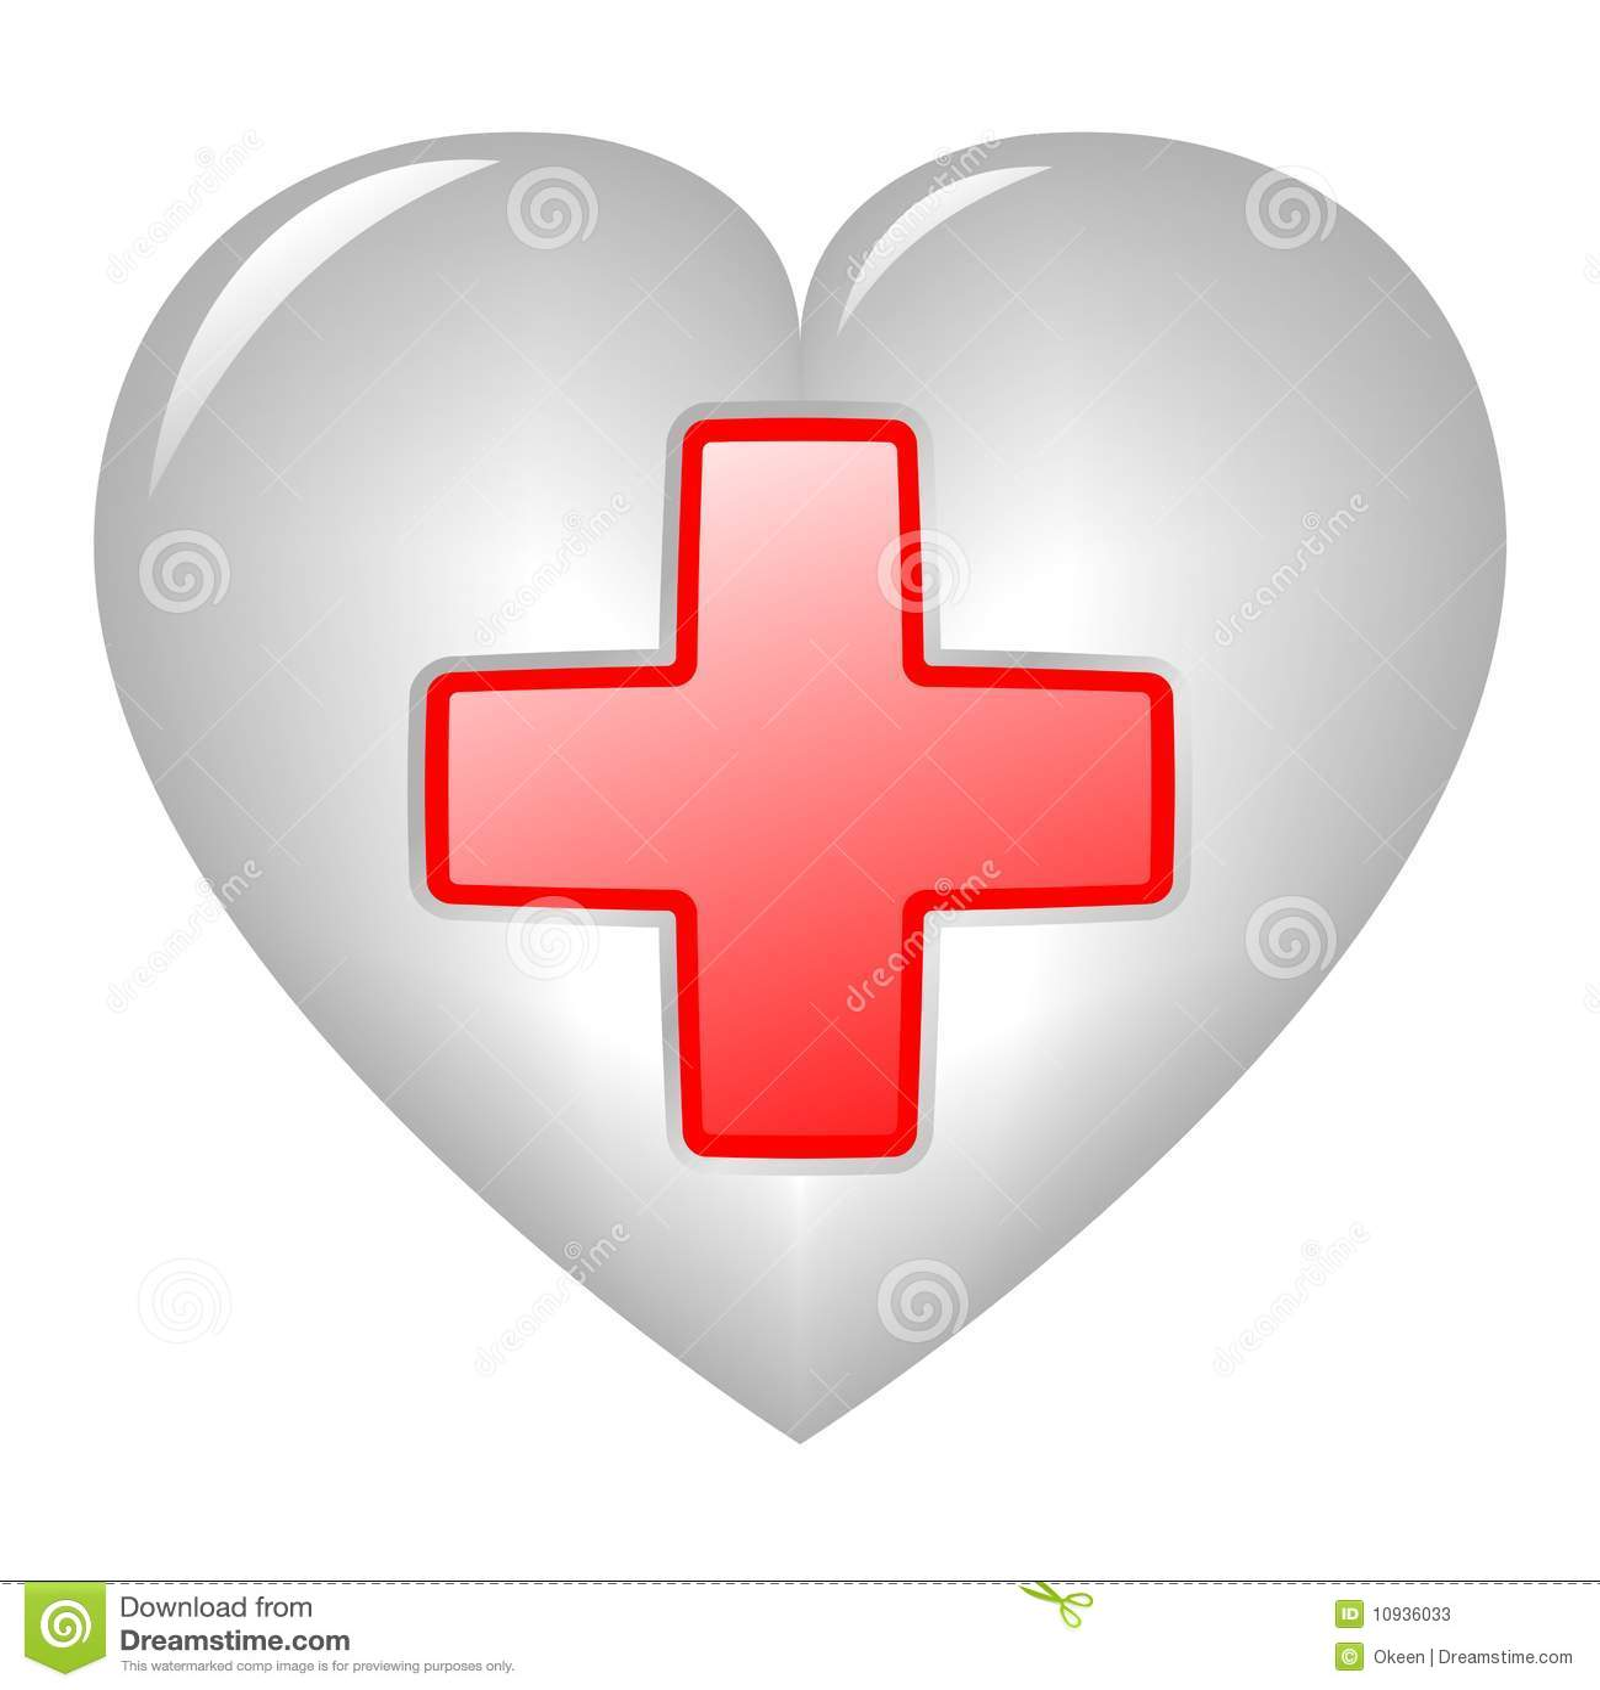 3d Love Red Heart Wallpaper Croix Rouge Sur Le Coeur Photo Stock 233 Ditorial Image